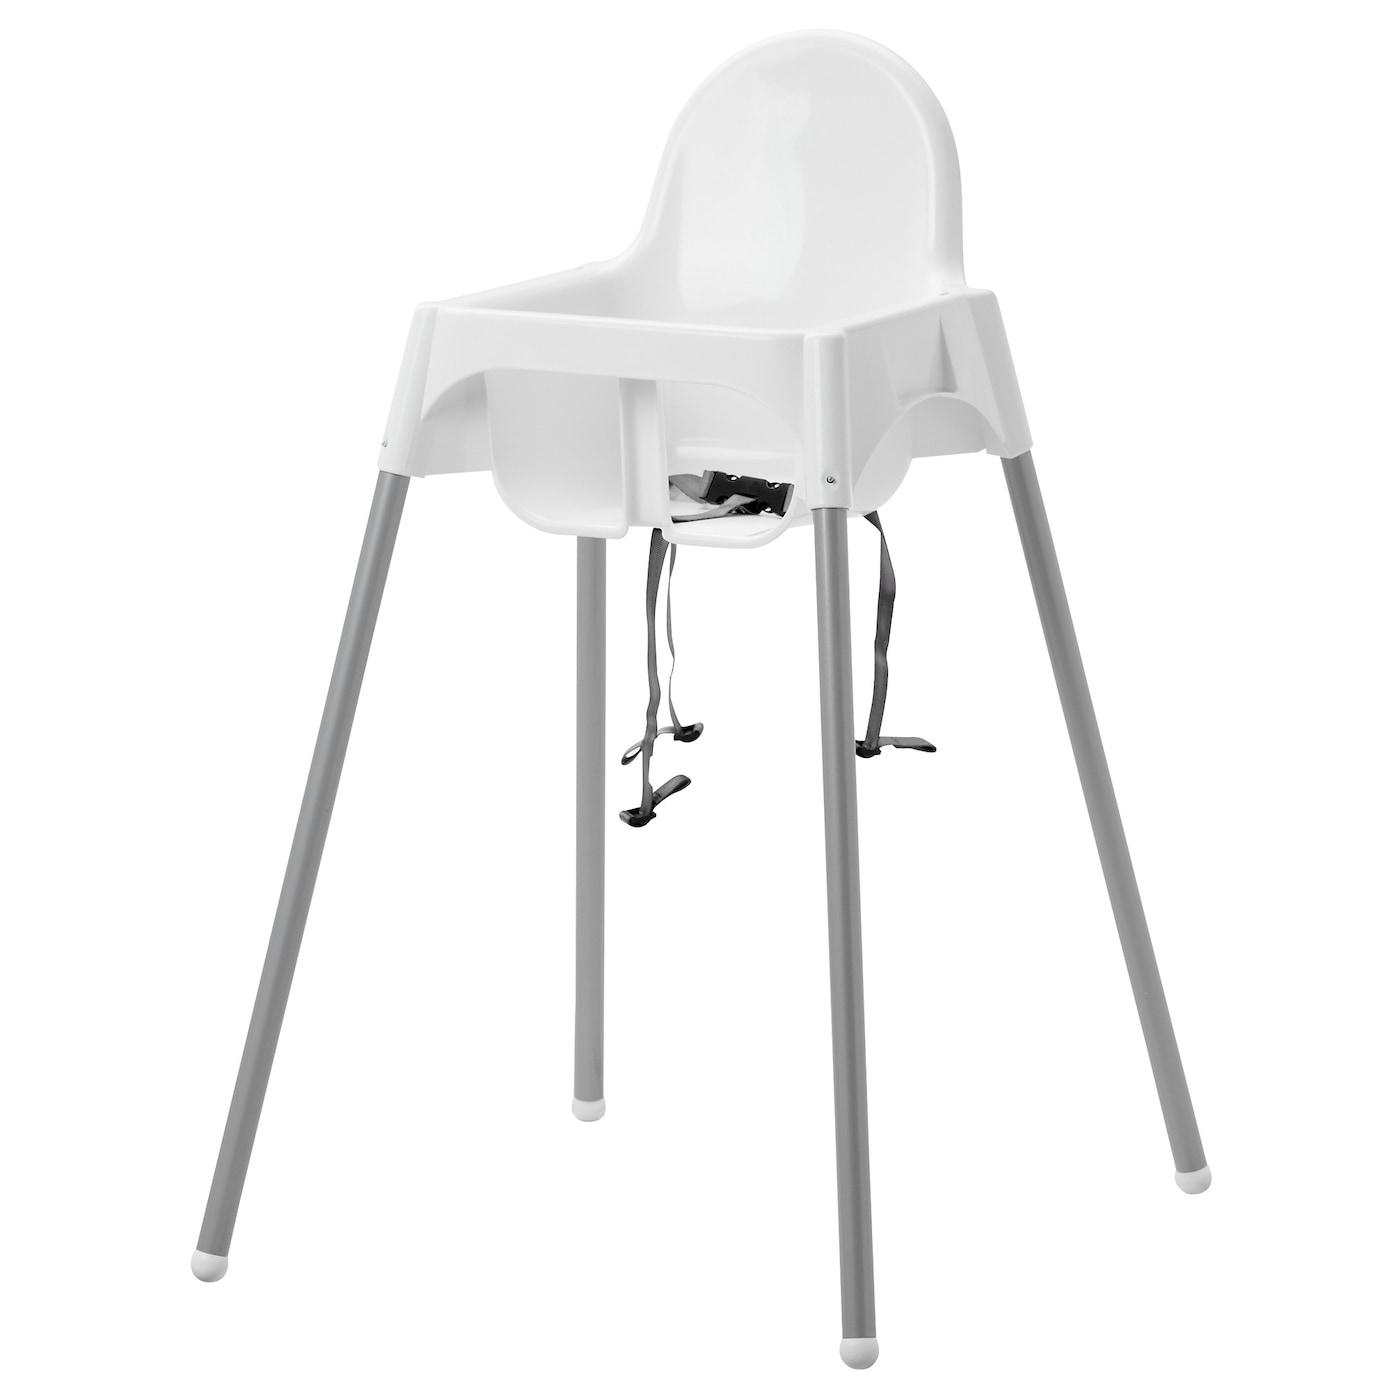 IKEA ANTILOP Kinderhochstuhl